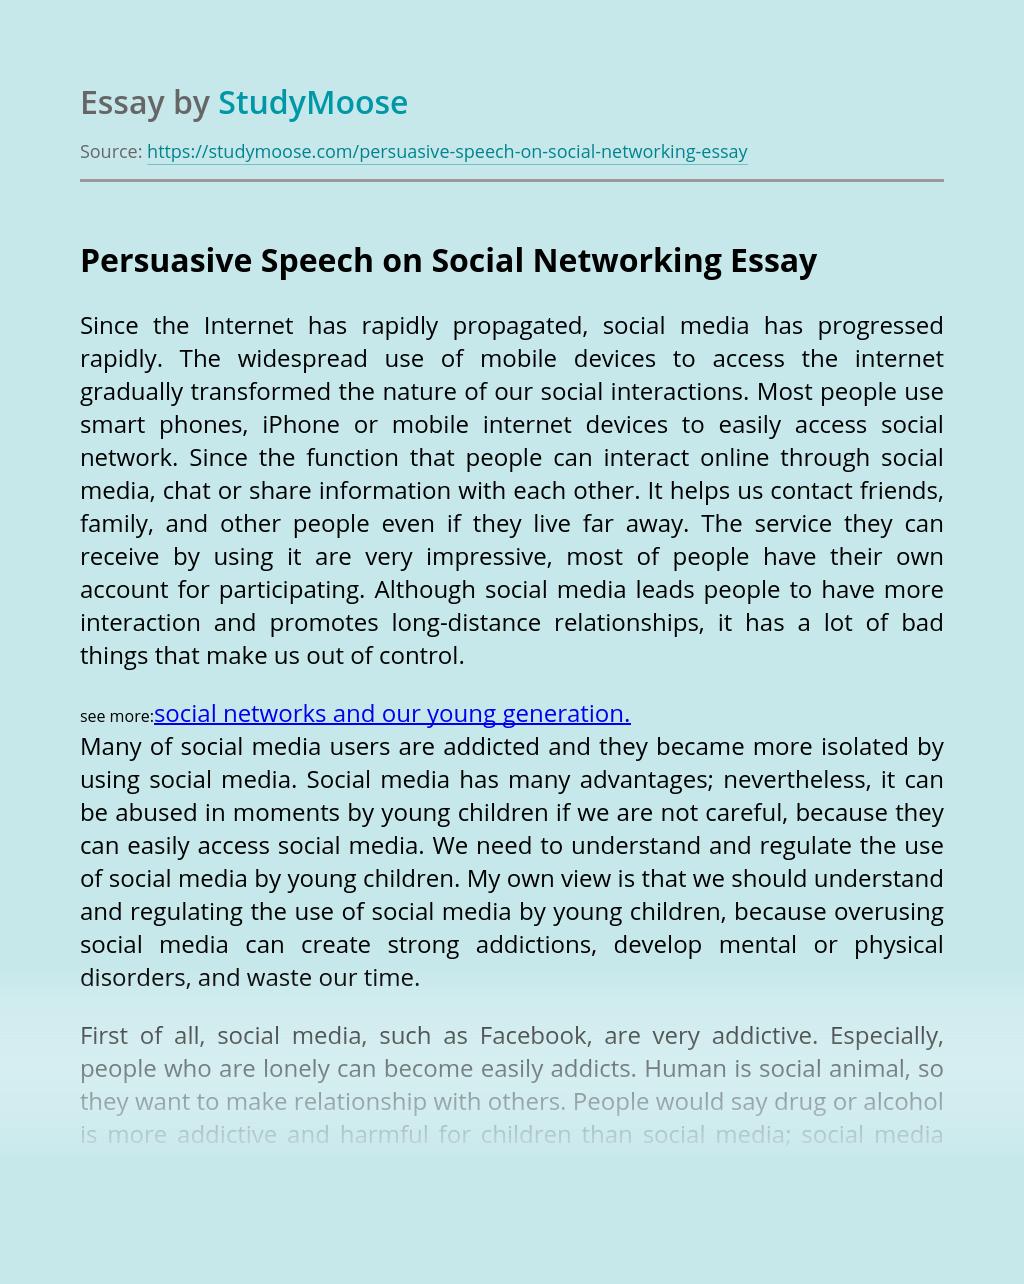 Persuasive Speech on Social Networking